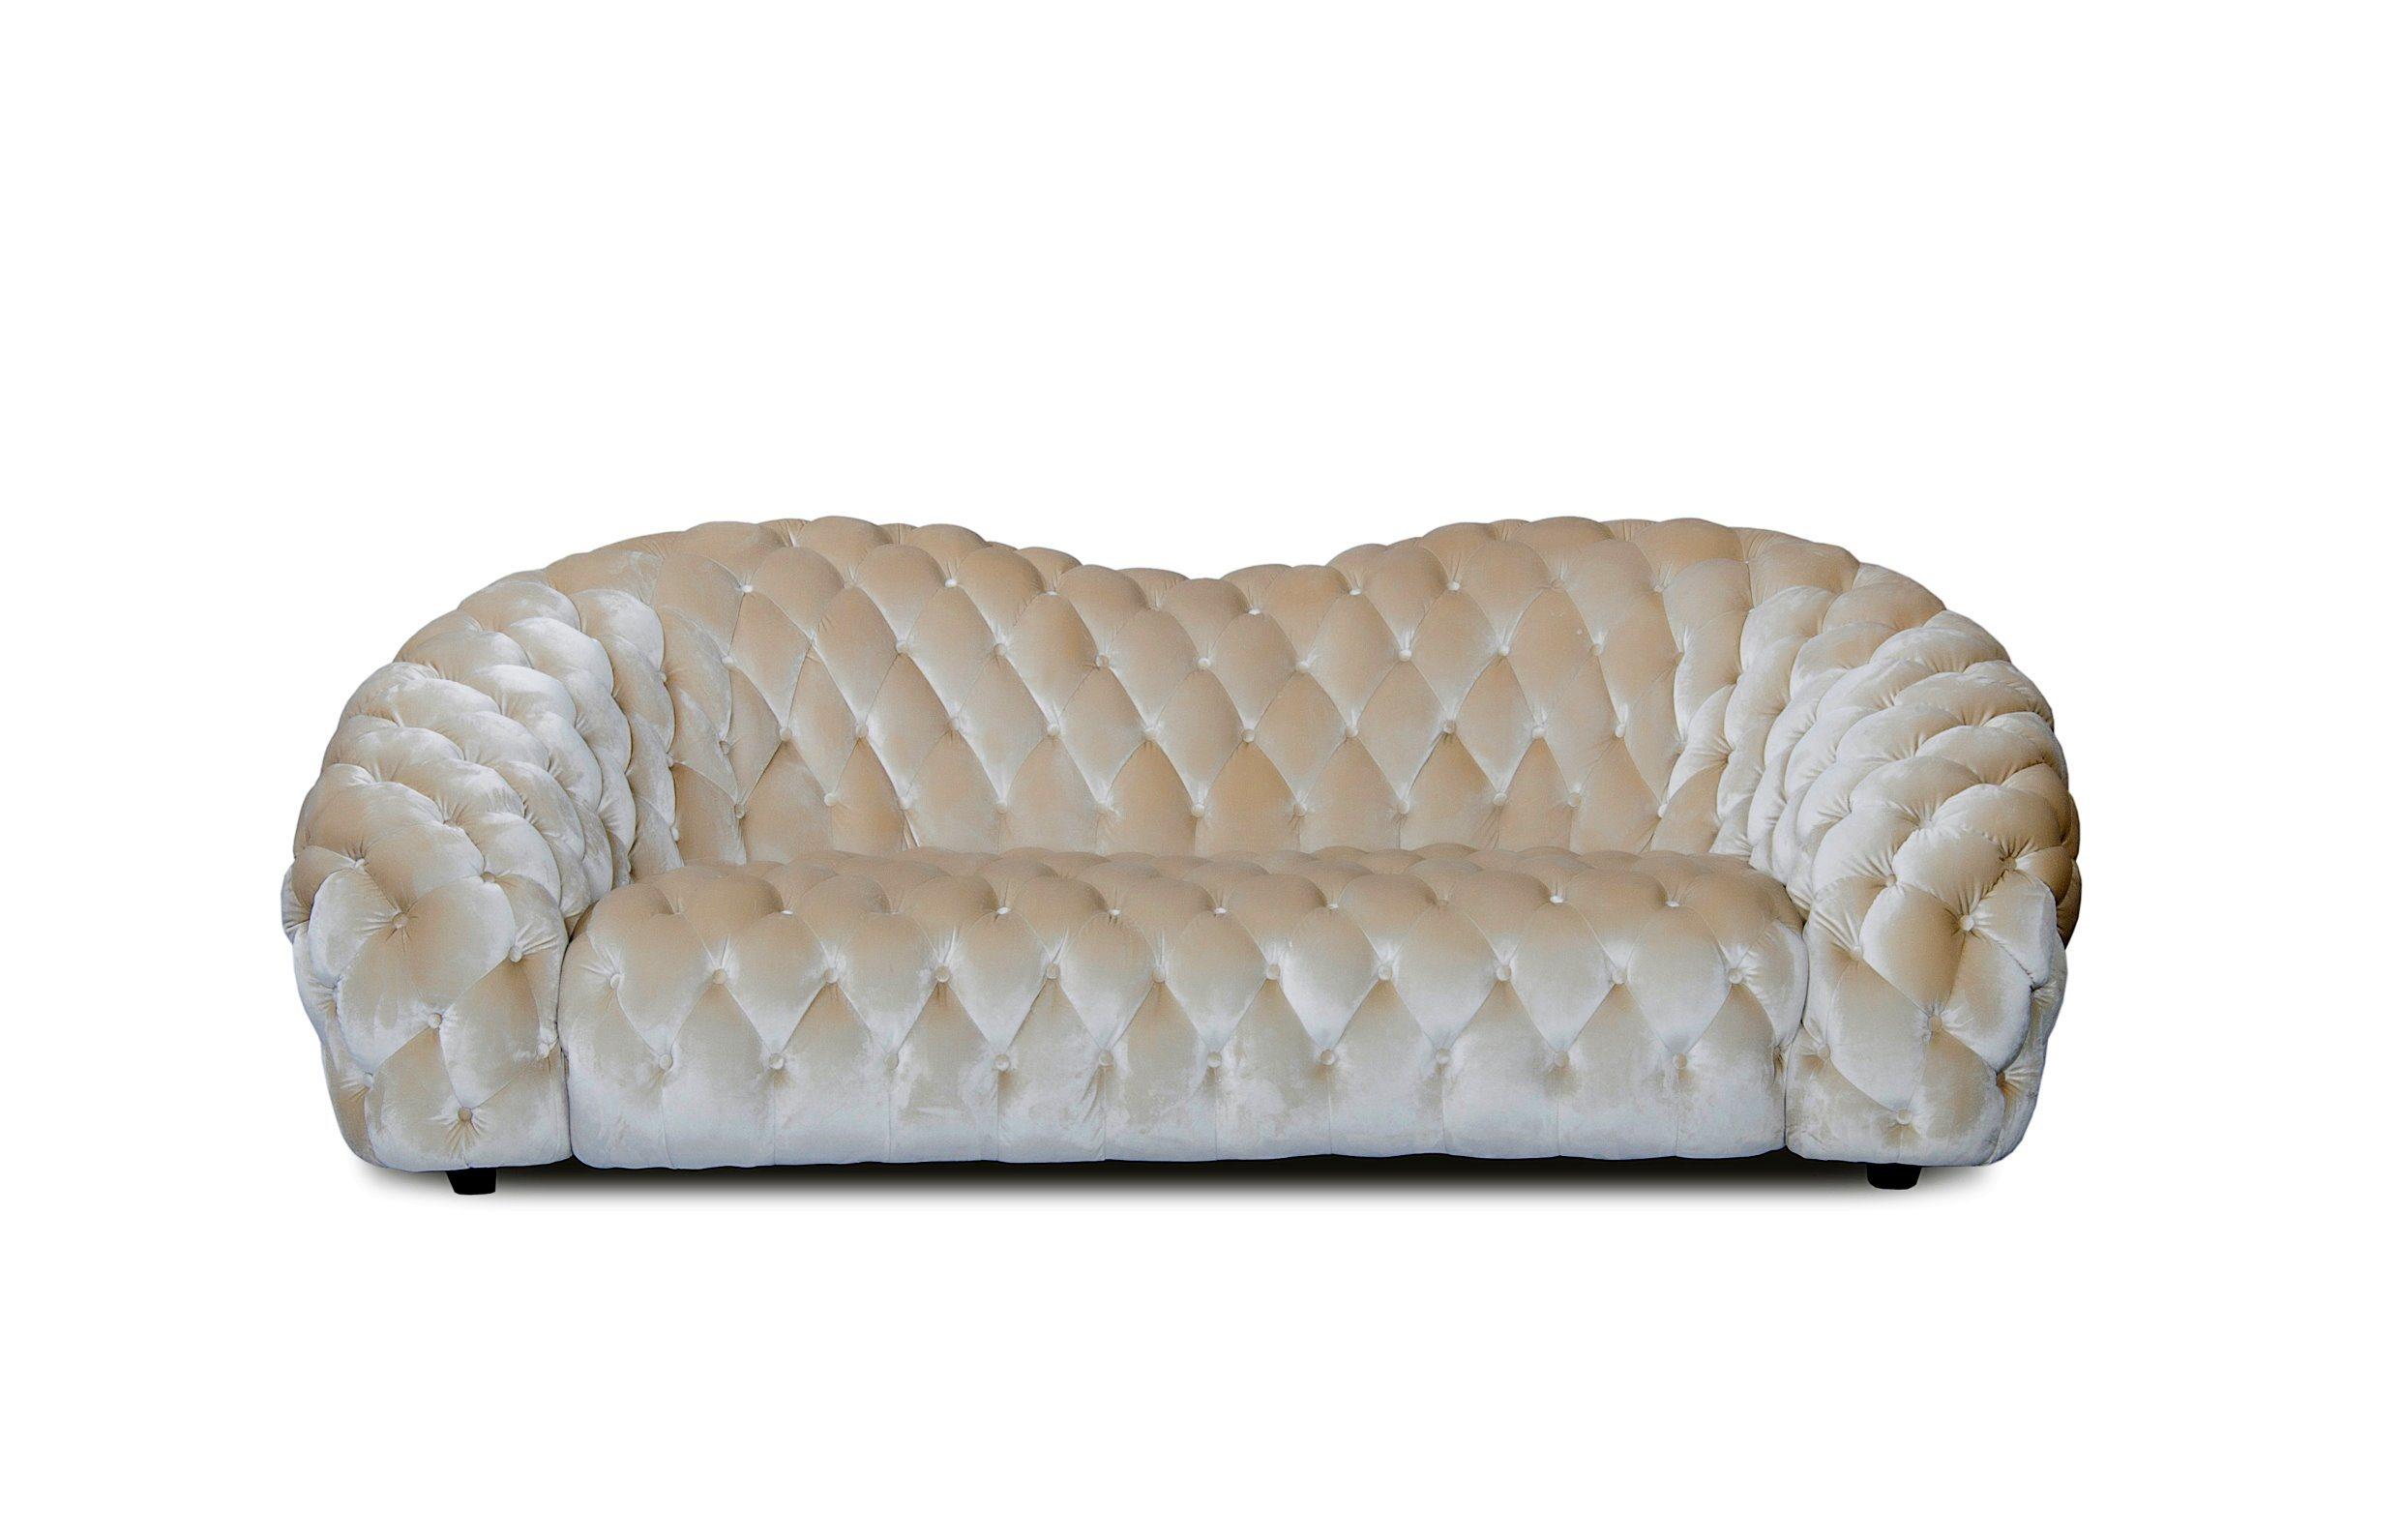 Modern Lady Bedroom Furniture Sofa